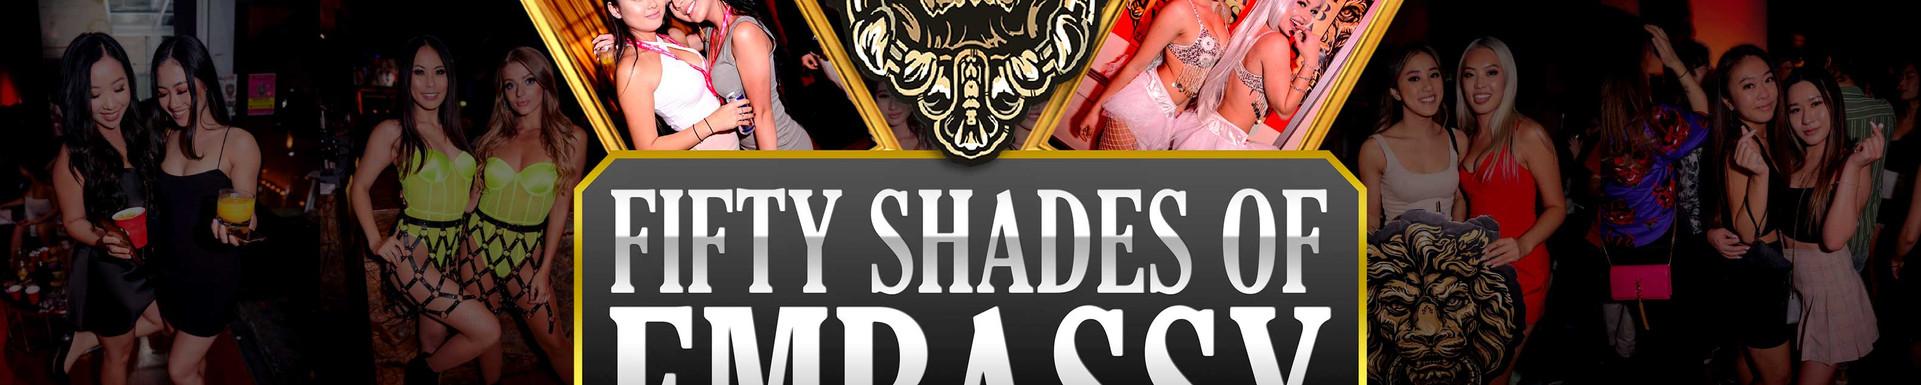 Embassy Fifty Shades of Embassy MAR 14